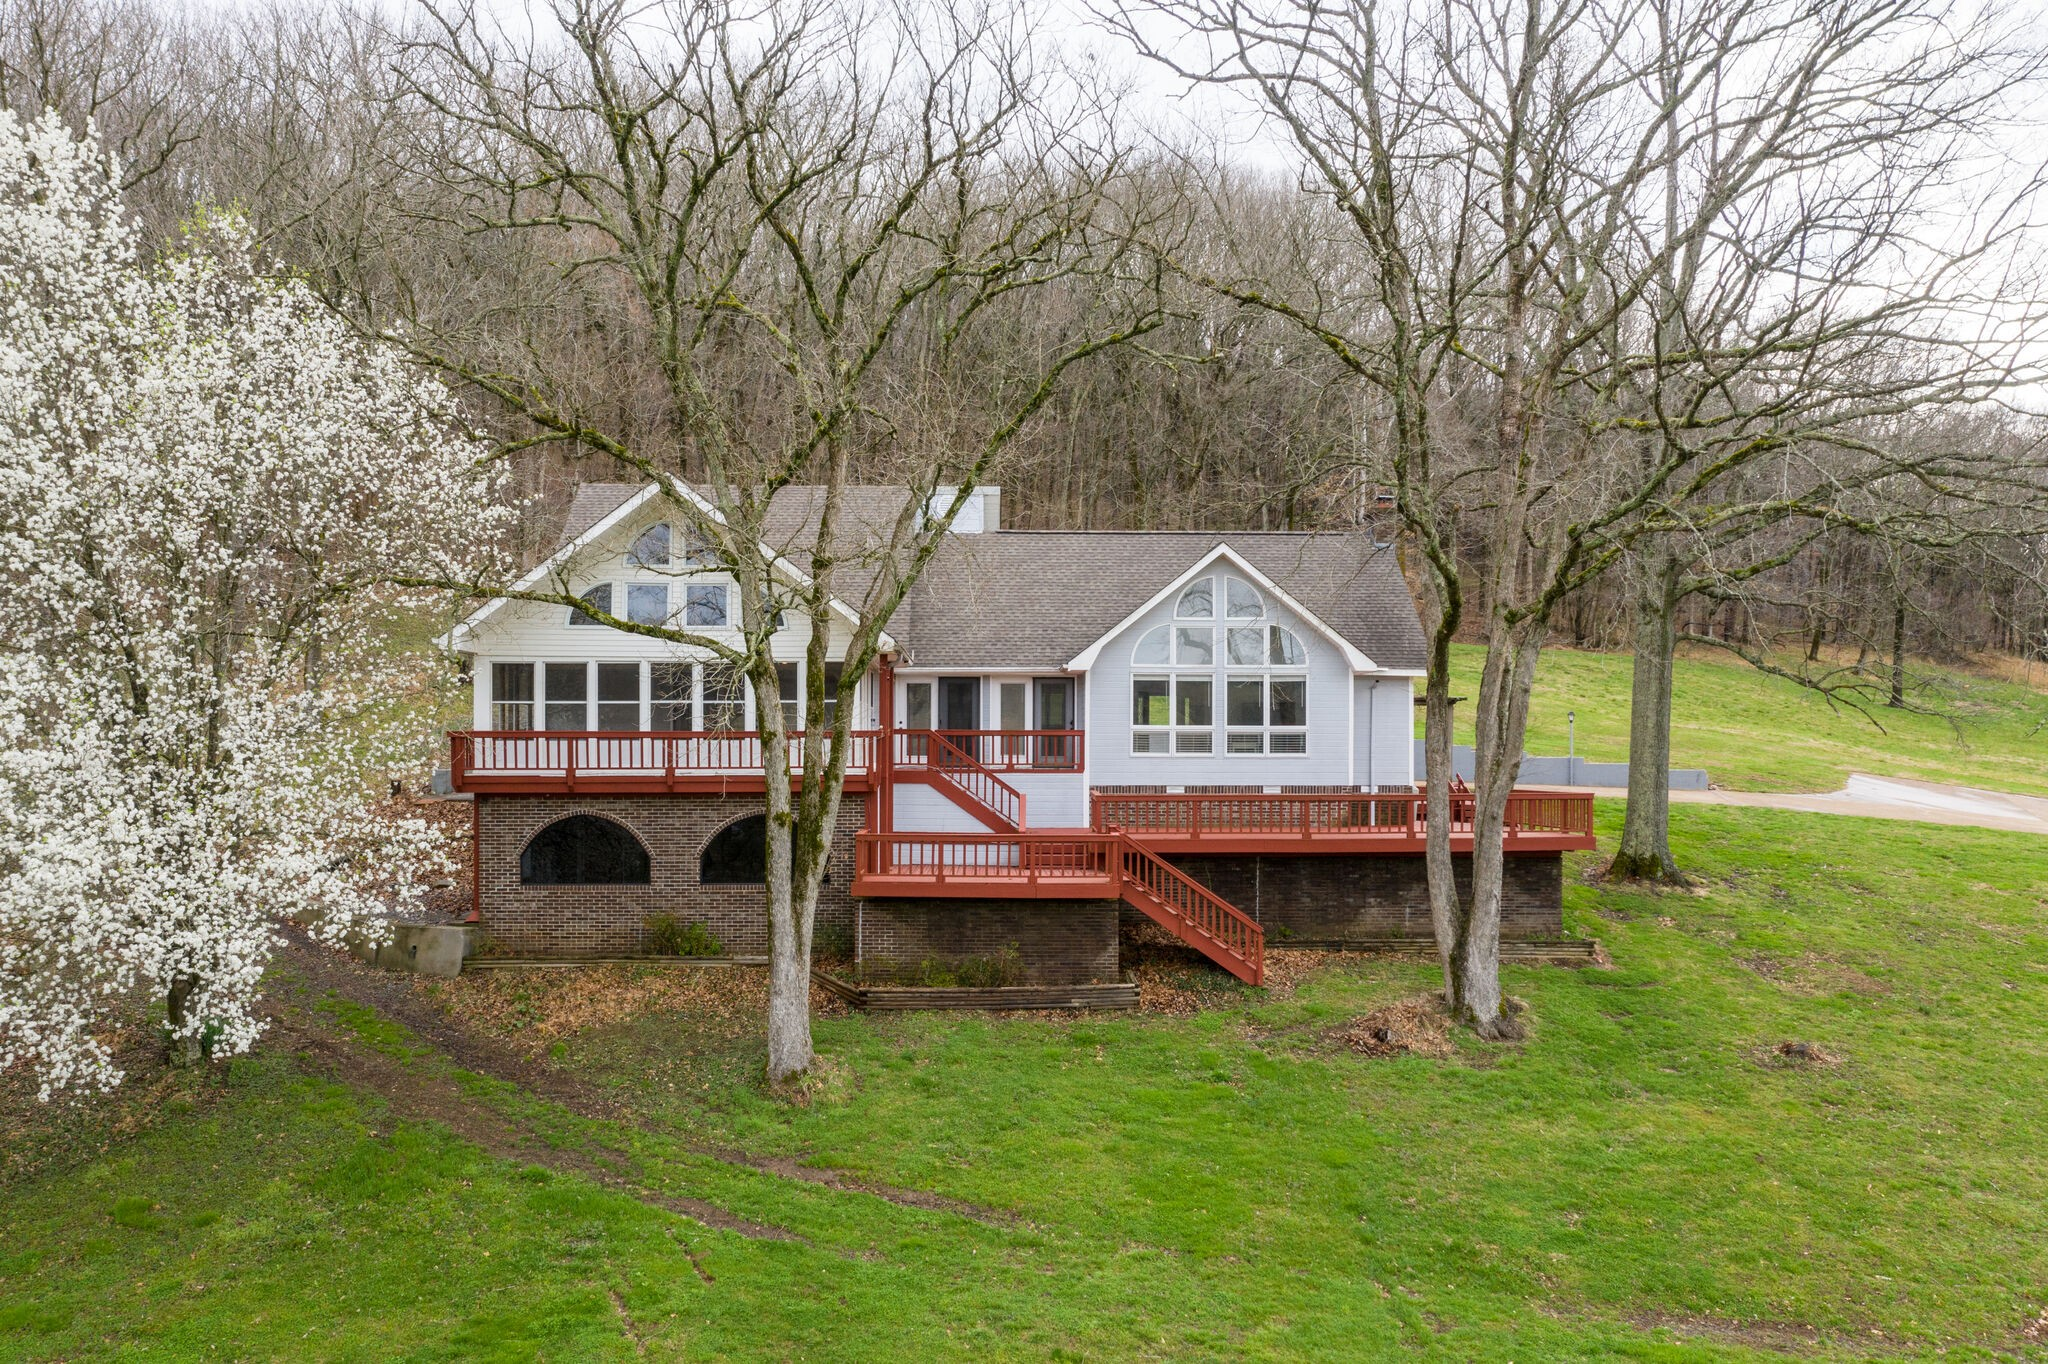 851 Shelbyville Hwy Property Photo - Fayetteville, TN real estate listing